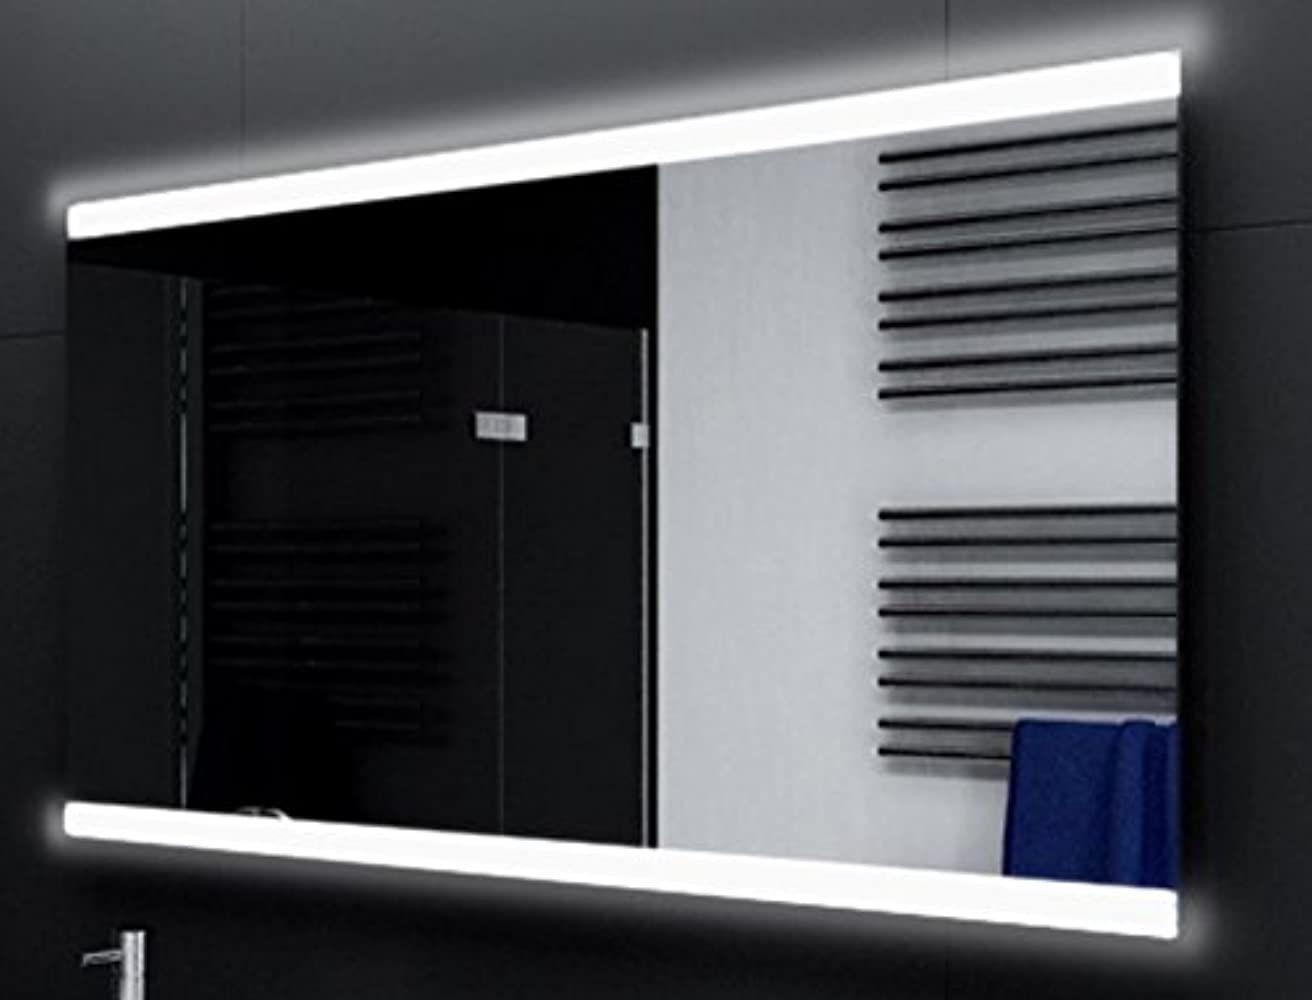 Badspiegel Designo Ma2510 Mit A Led Beleuchtung B 150 Cm X H